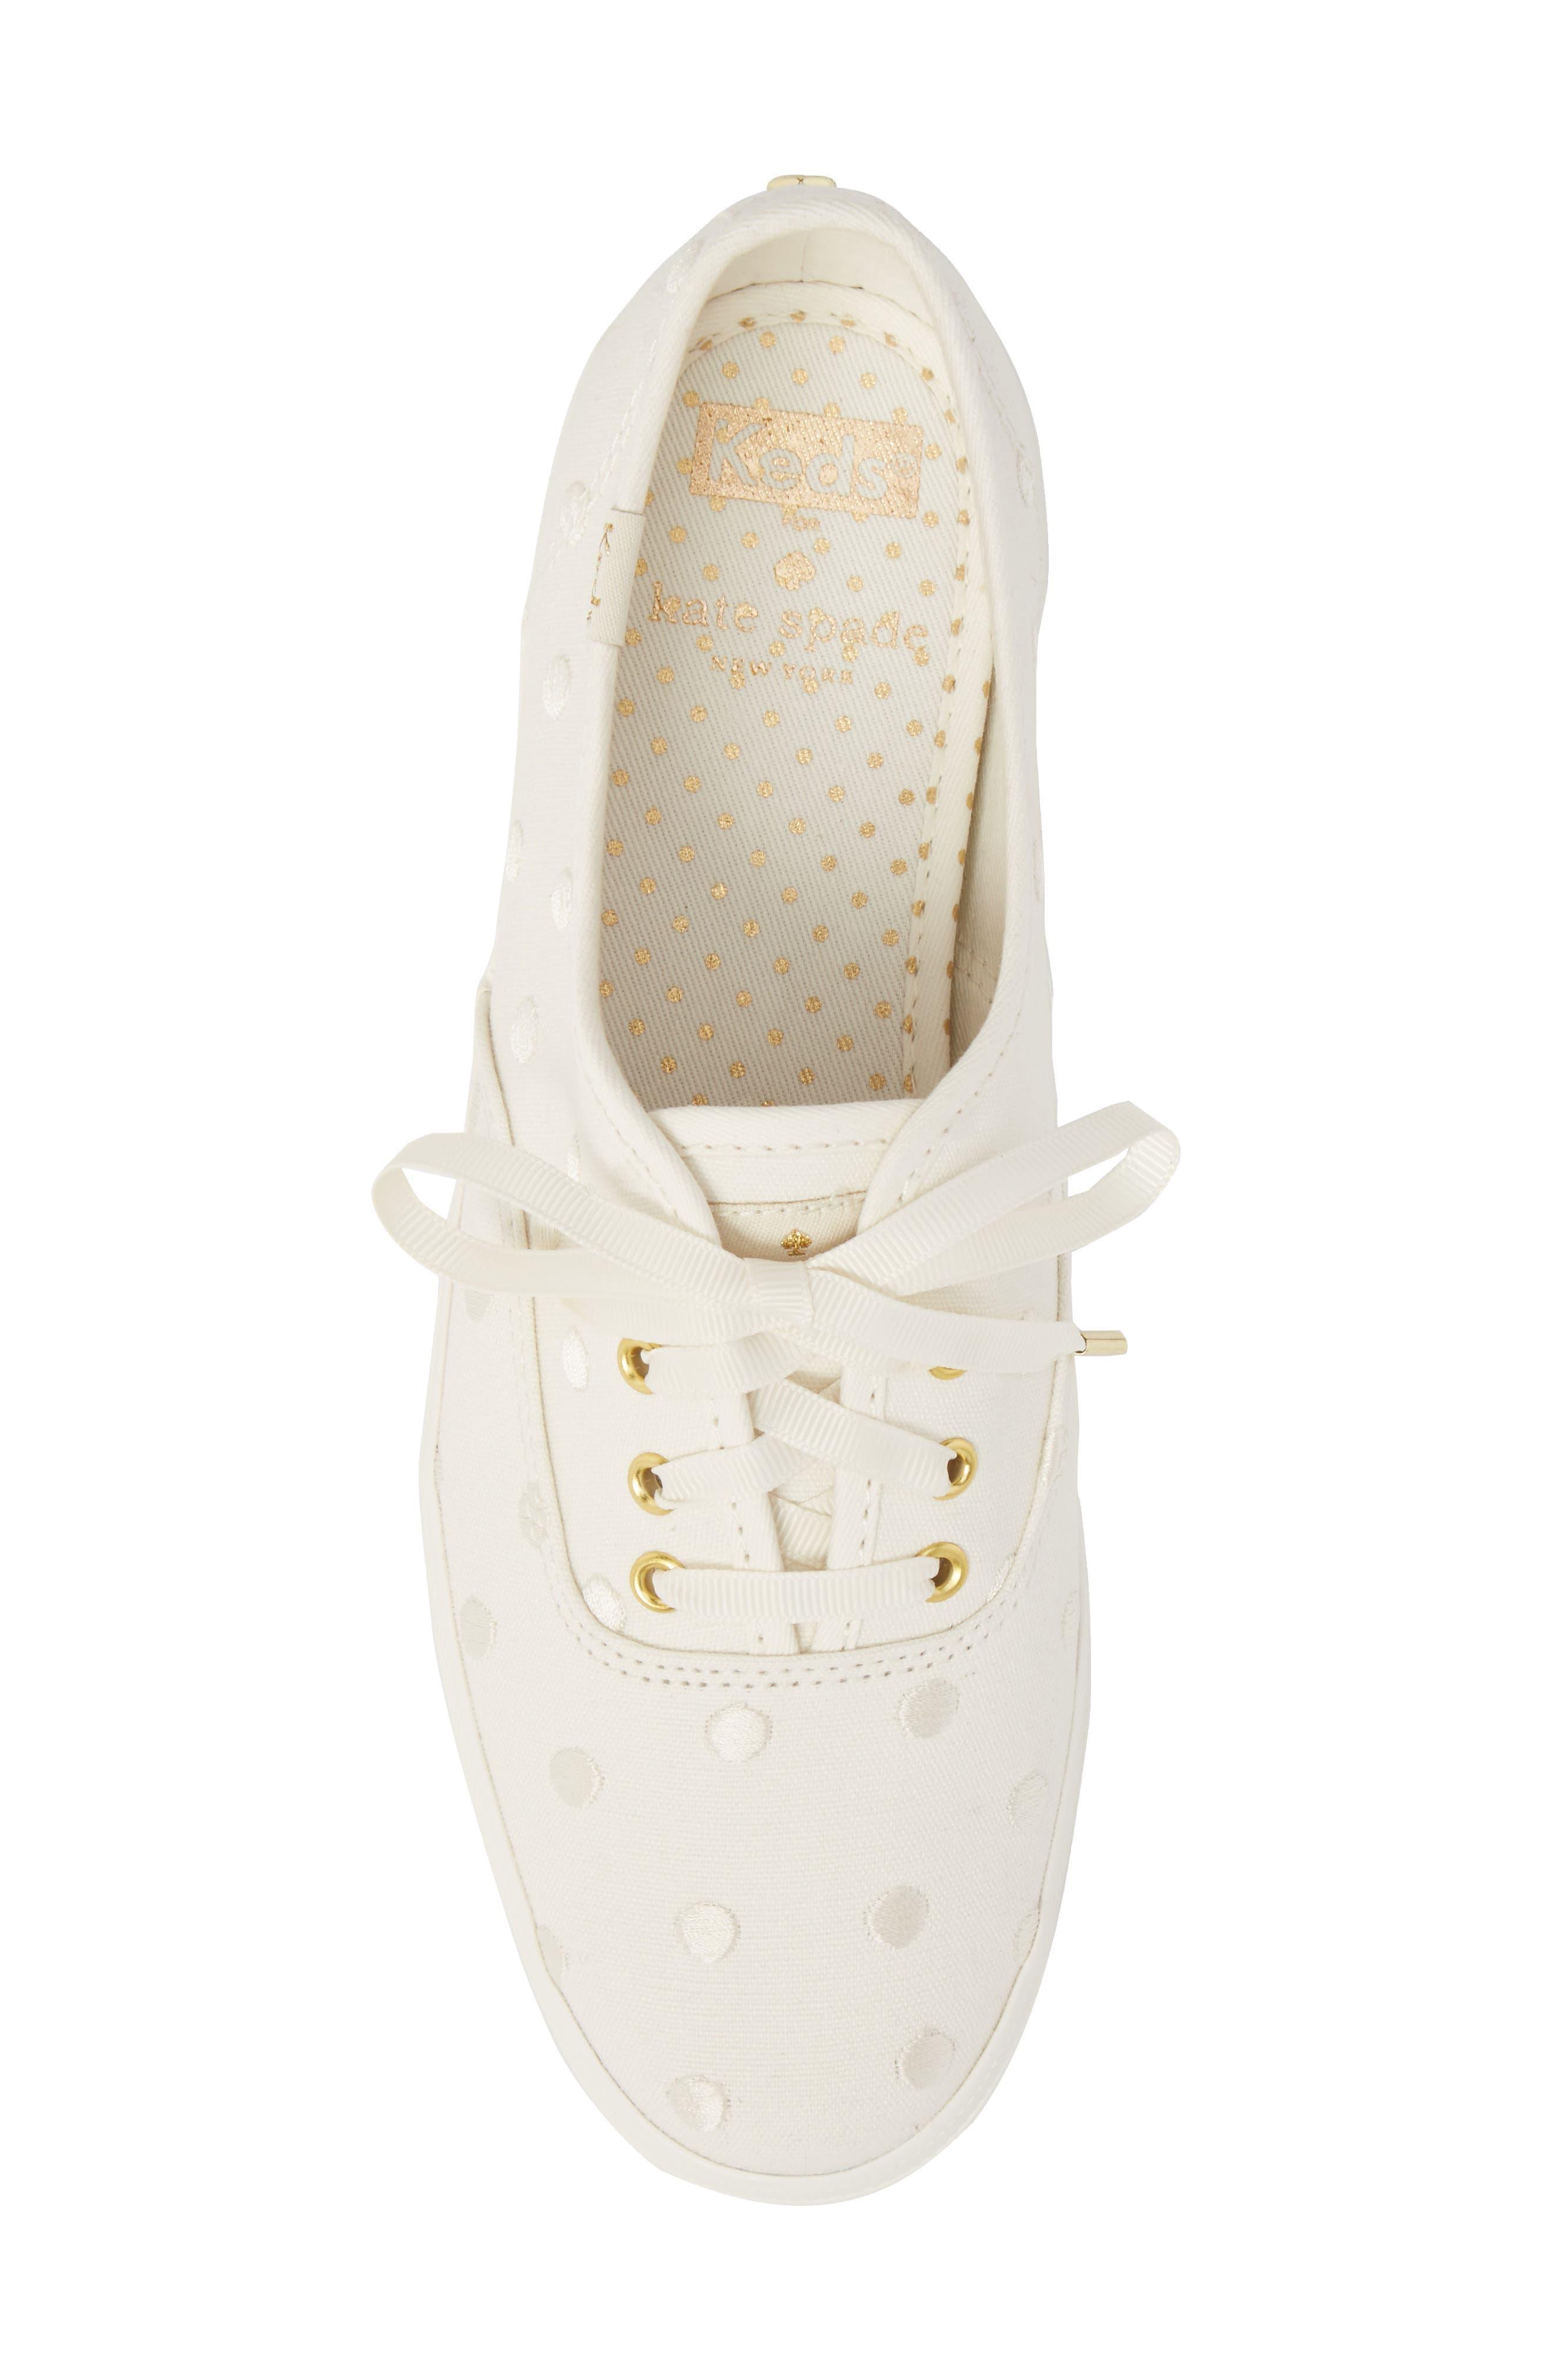 KEDS<SUP>®</SUP> FOR KATE SPADE NEW YORK, champion dancing dot sneaker, Alternate thumbnail 5, color, WHITE